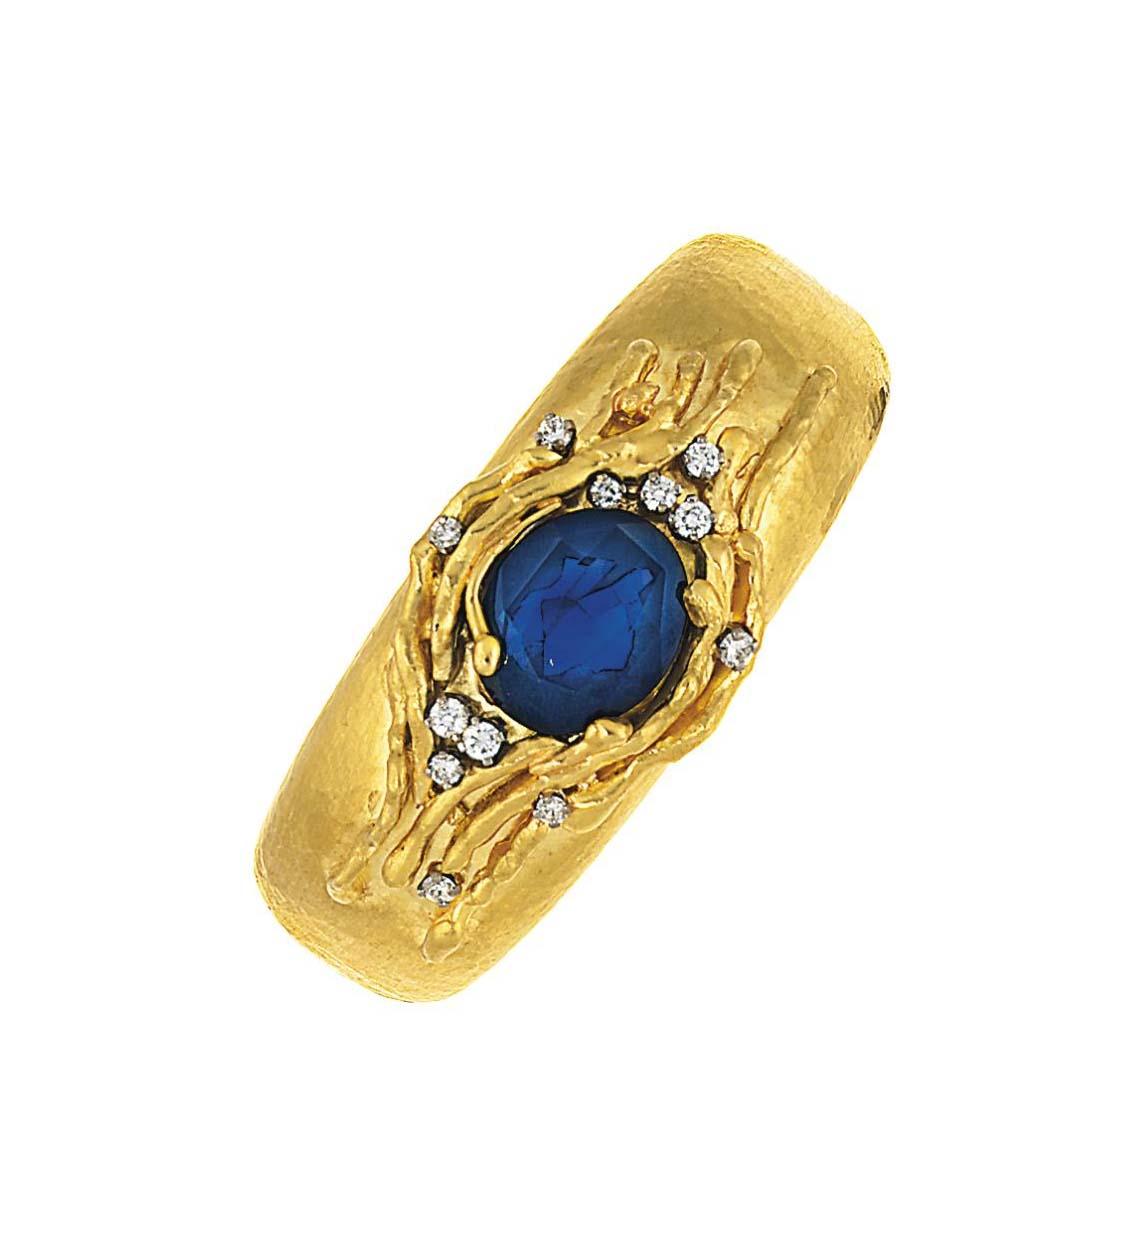 A sapphire and diamond-set bangle, by Grima